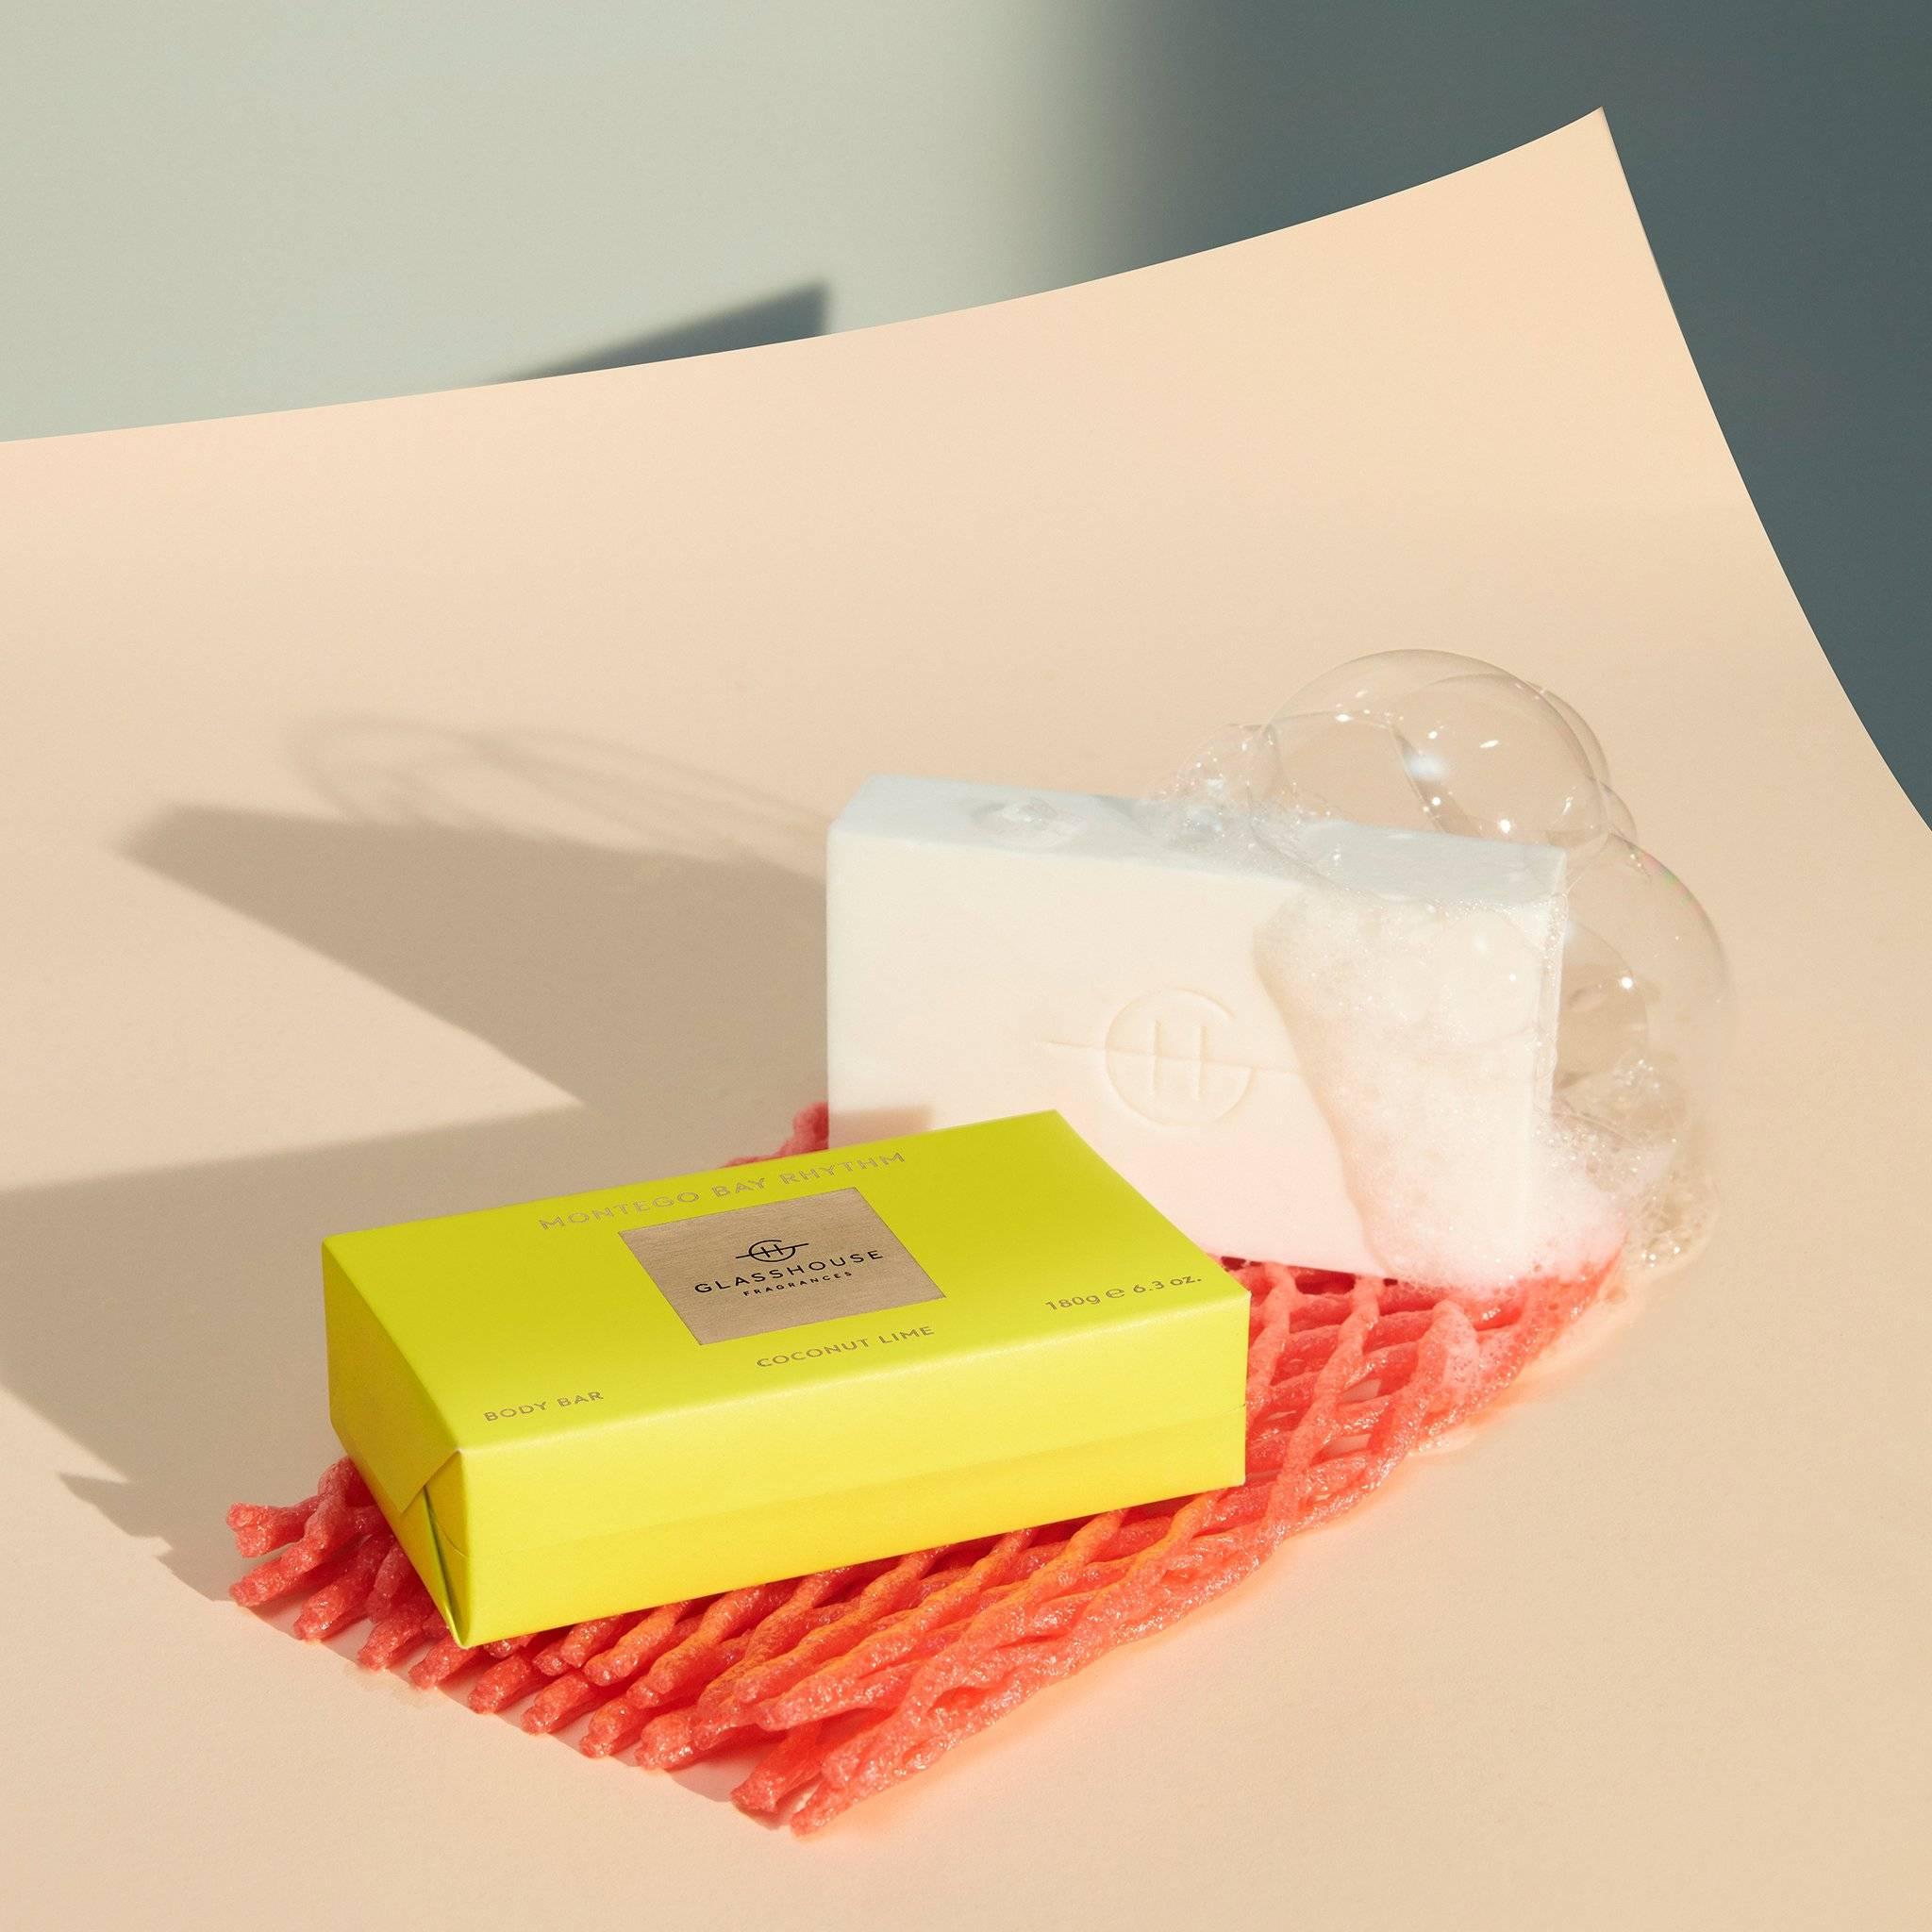 Glasshouse Soap